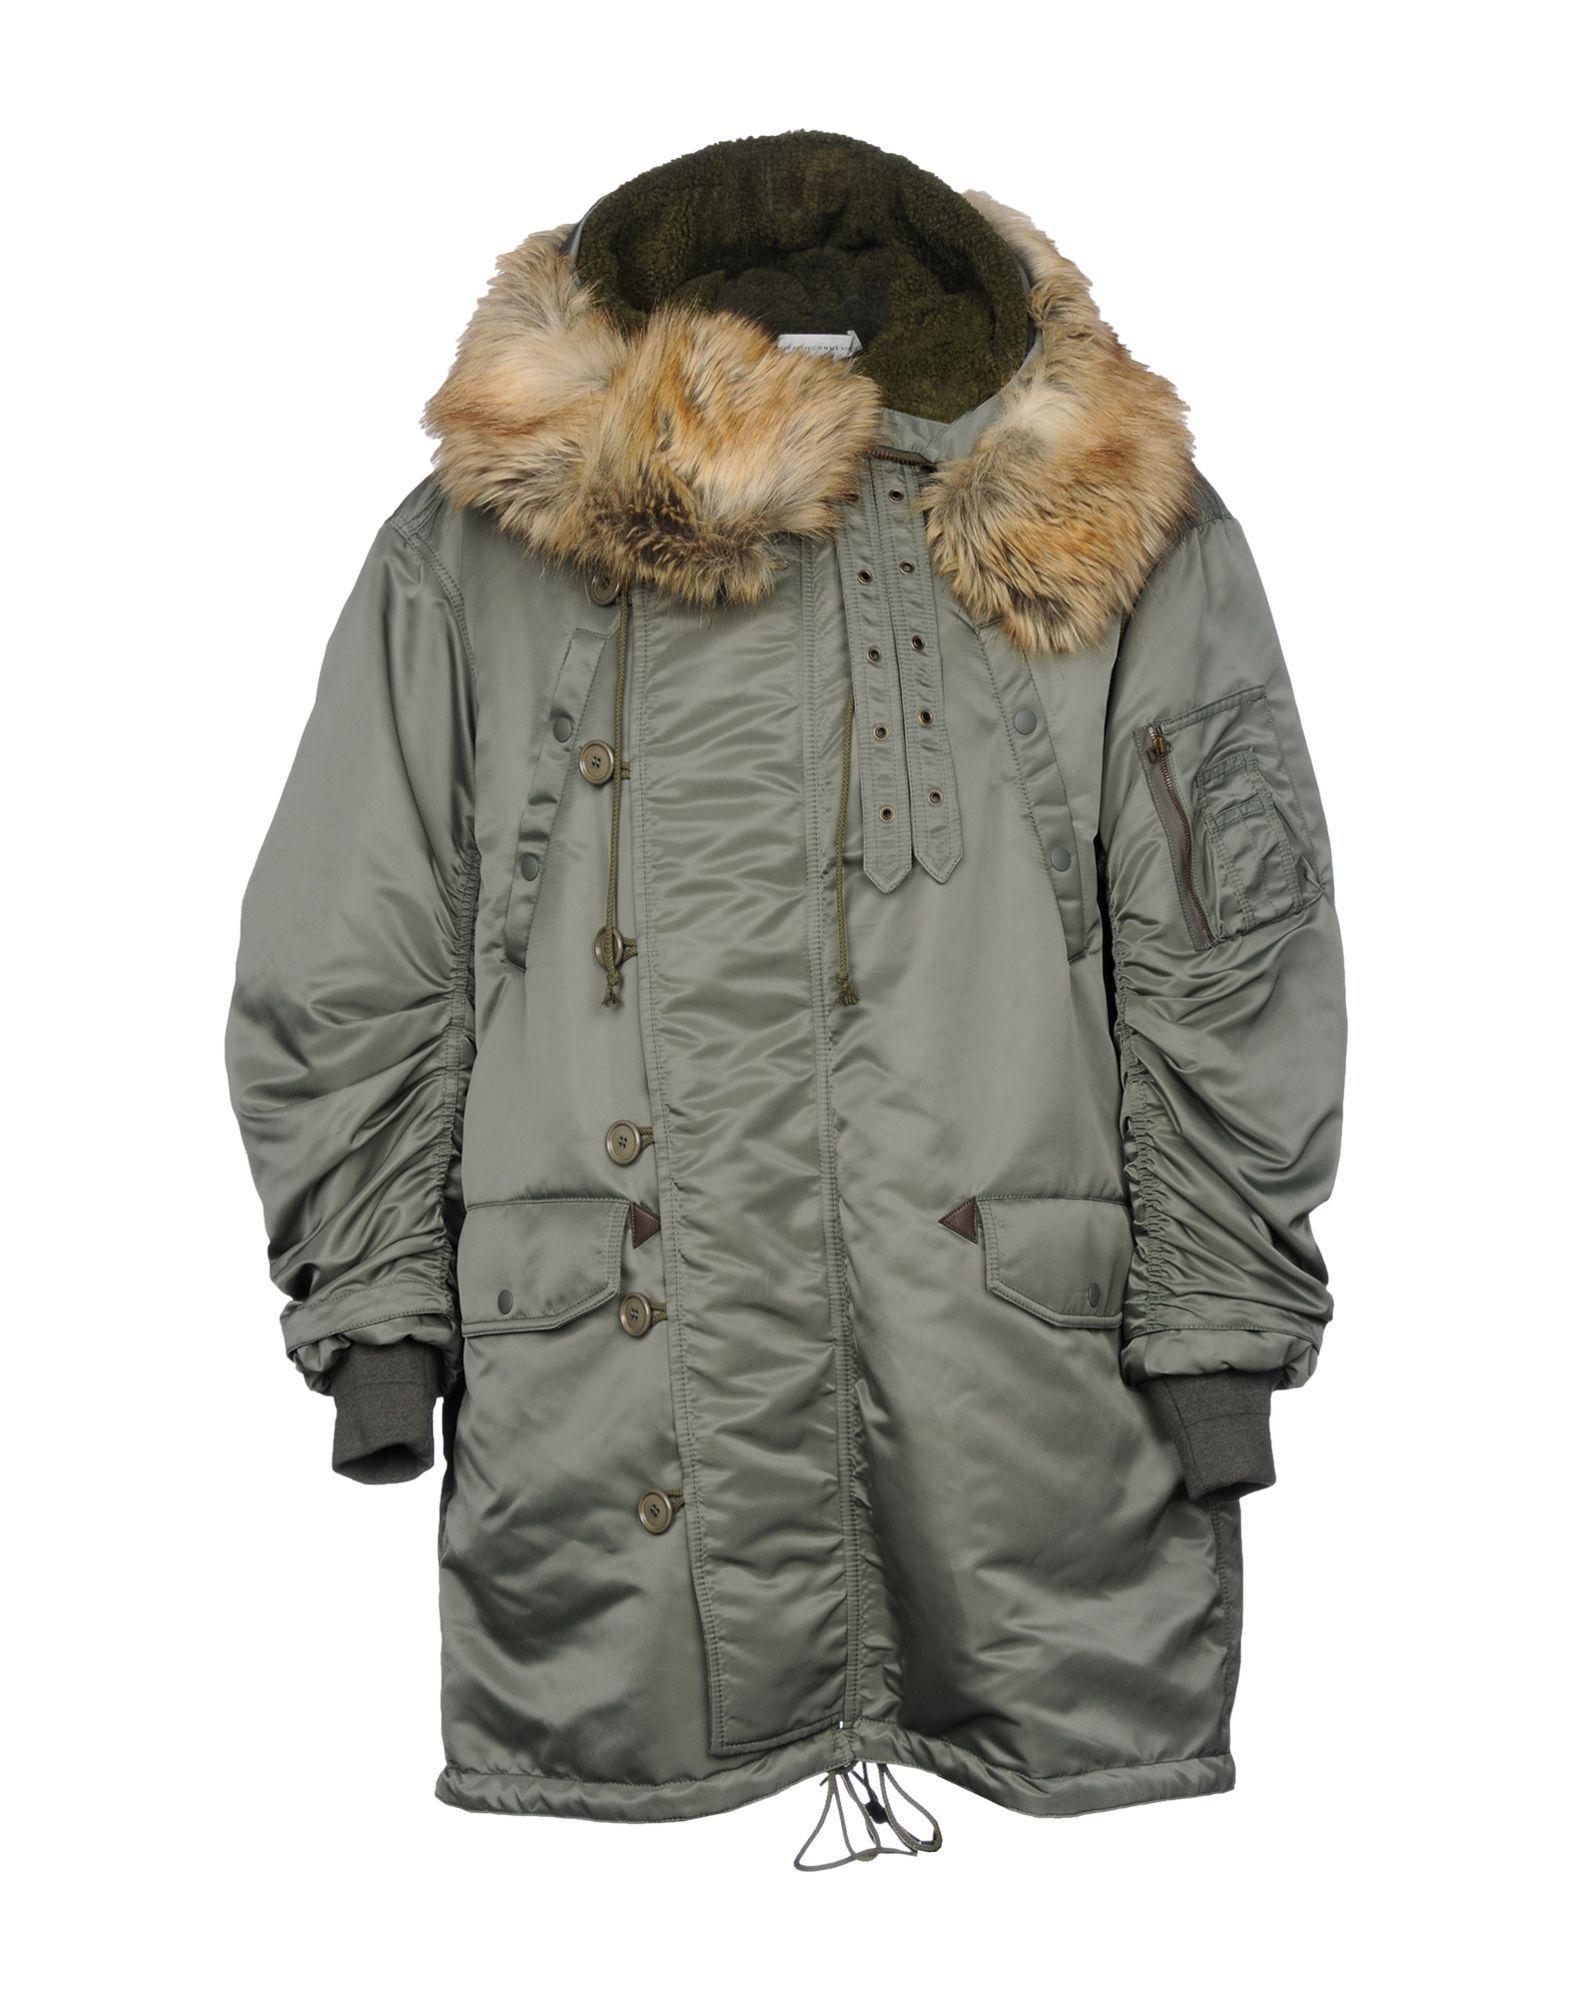 Faith Connexion Military Green Faux Fur Parka Jacket